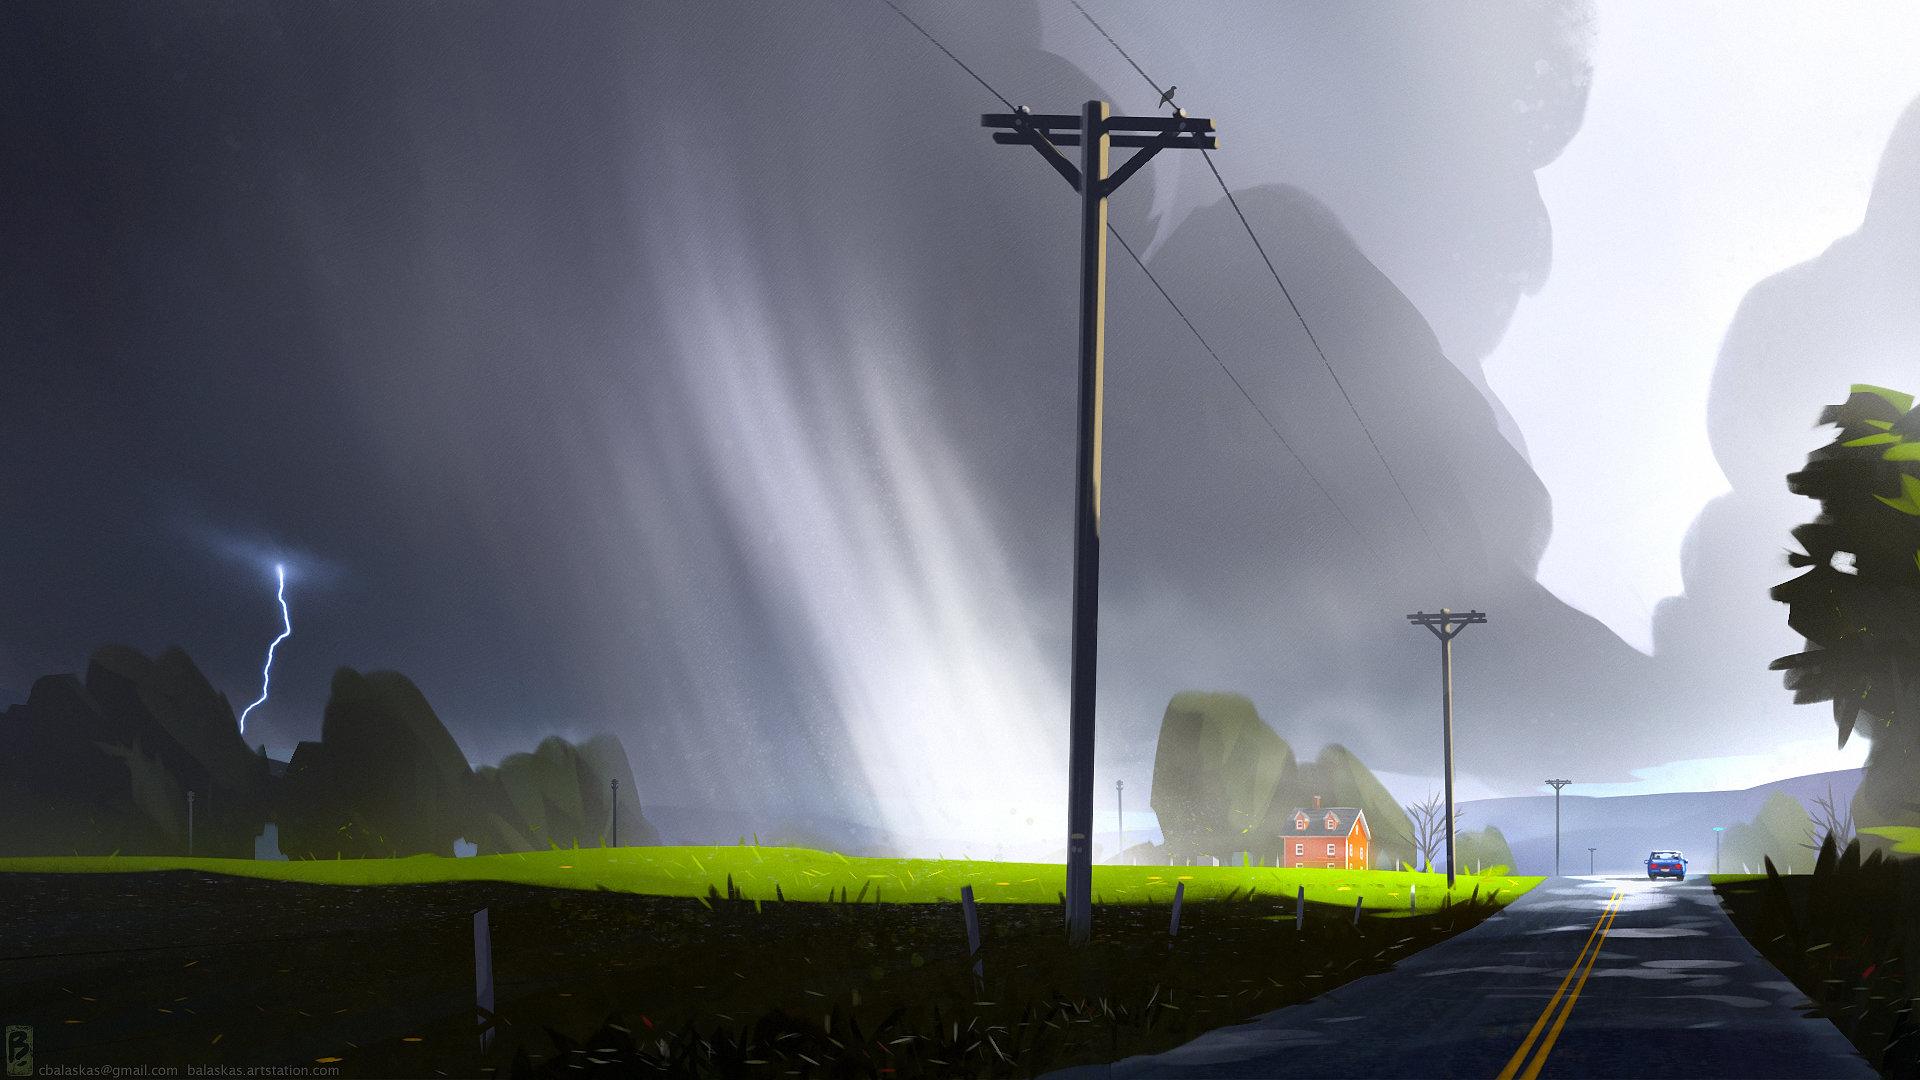 Christopher balaskas stormy road as